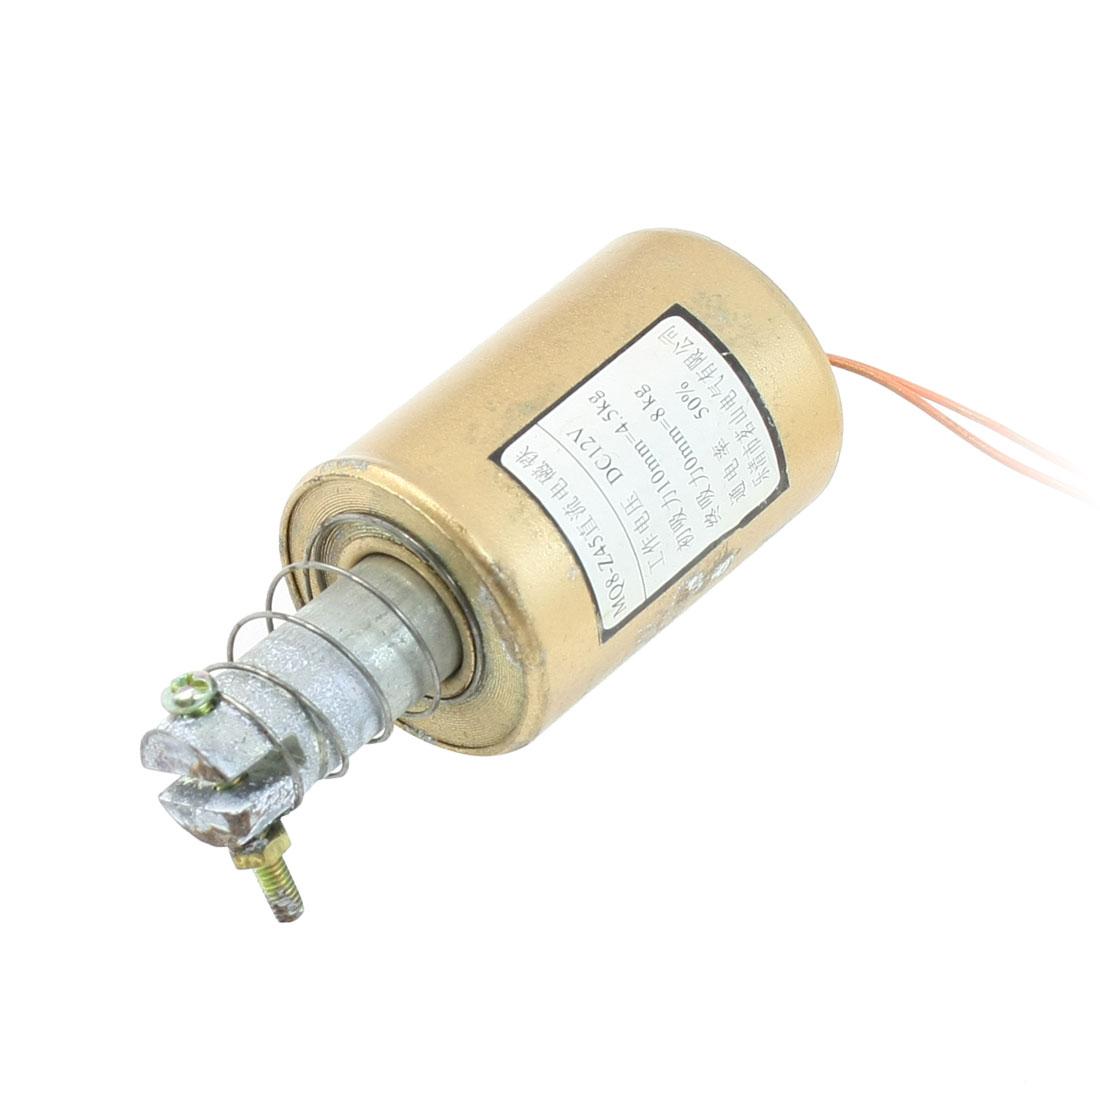 12V DC Pull Type Tubular Frame Electromagnet Solenoid Actuator